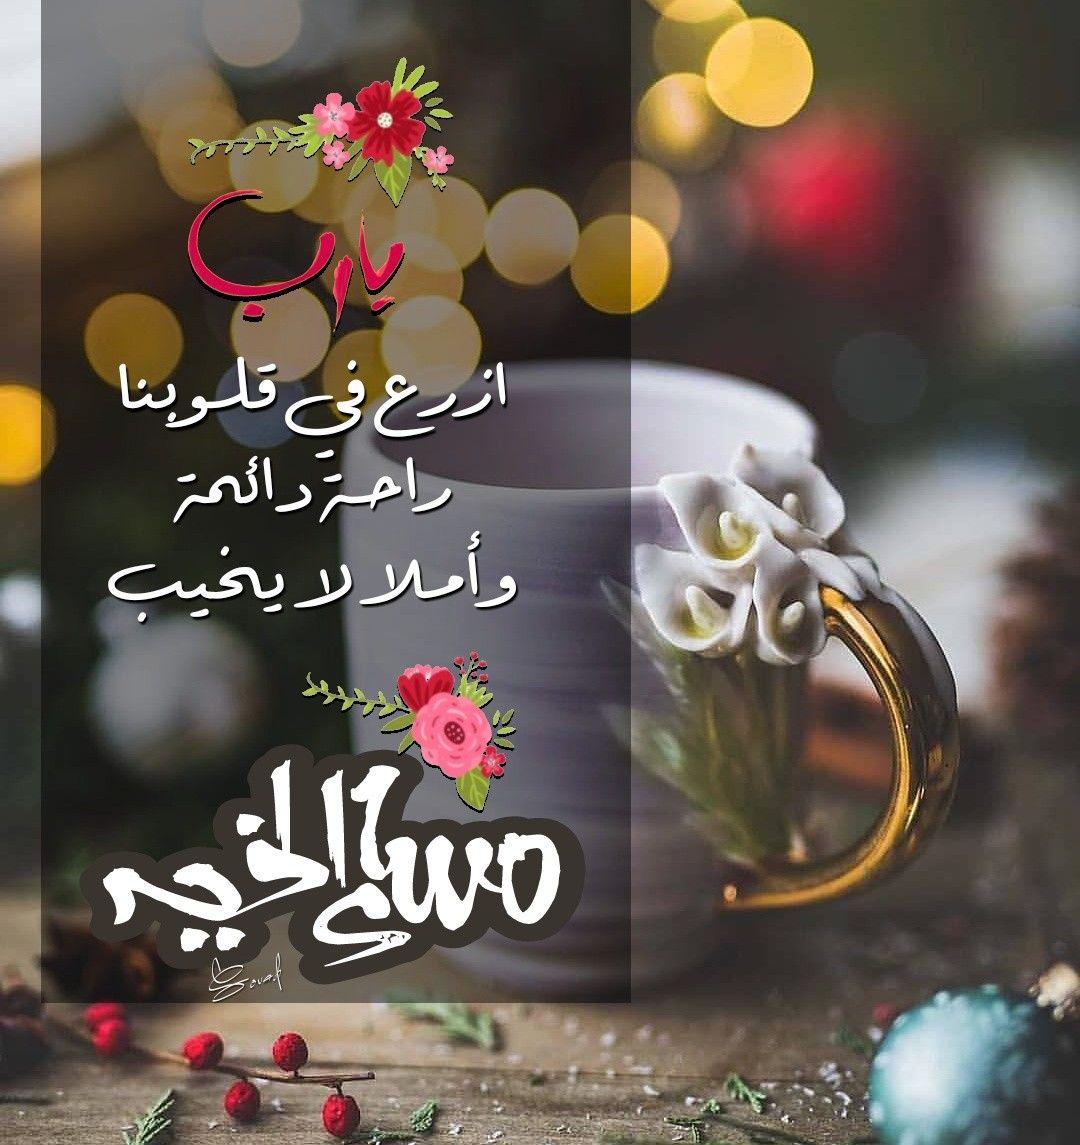 Pin By Hiam On صباح الخير Good Morning Images Flowers Good Morning Arabic Good Morning Wallpaper